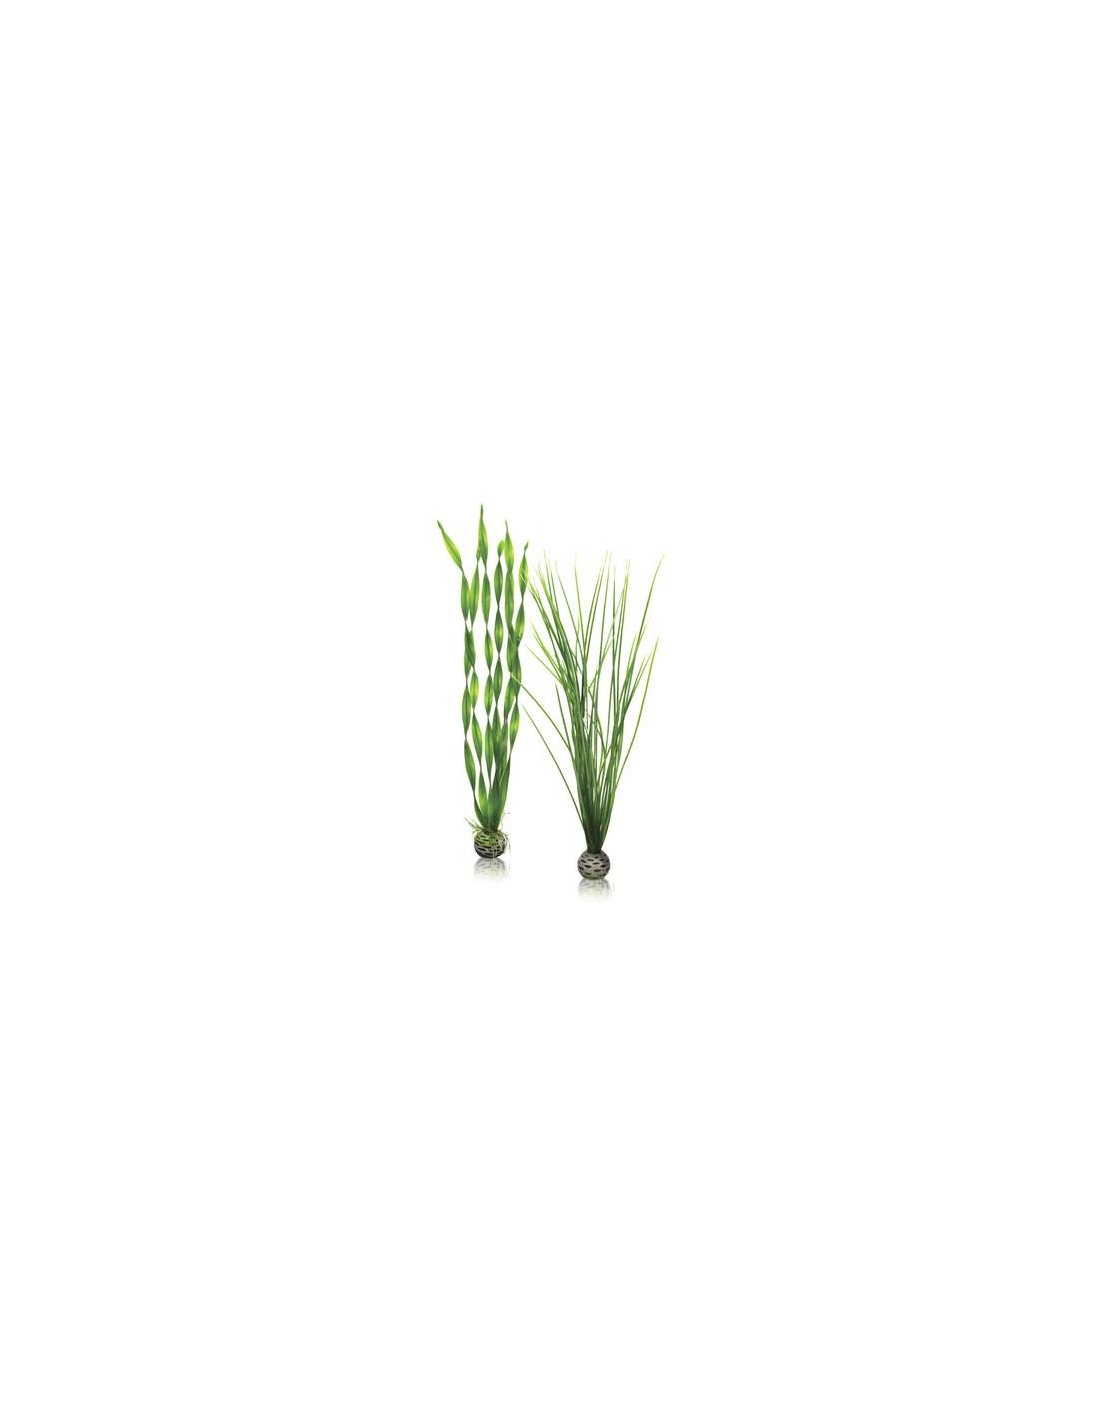 Biorb set de grandes plantes vertes oase for Grandes plantes vertes